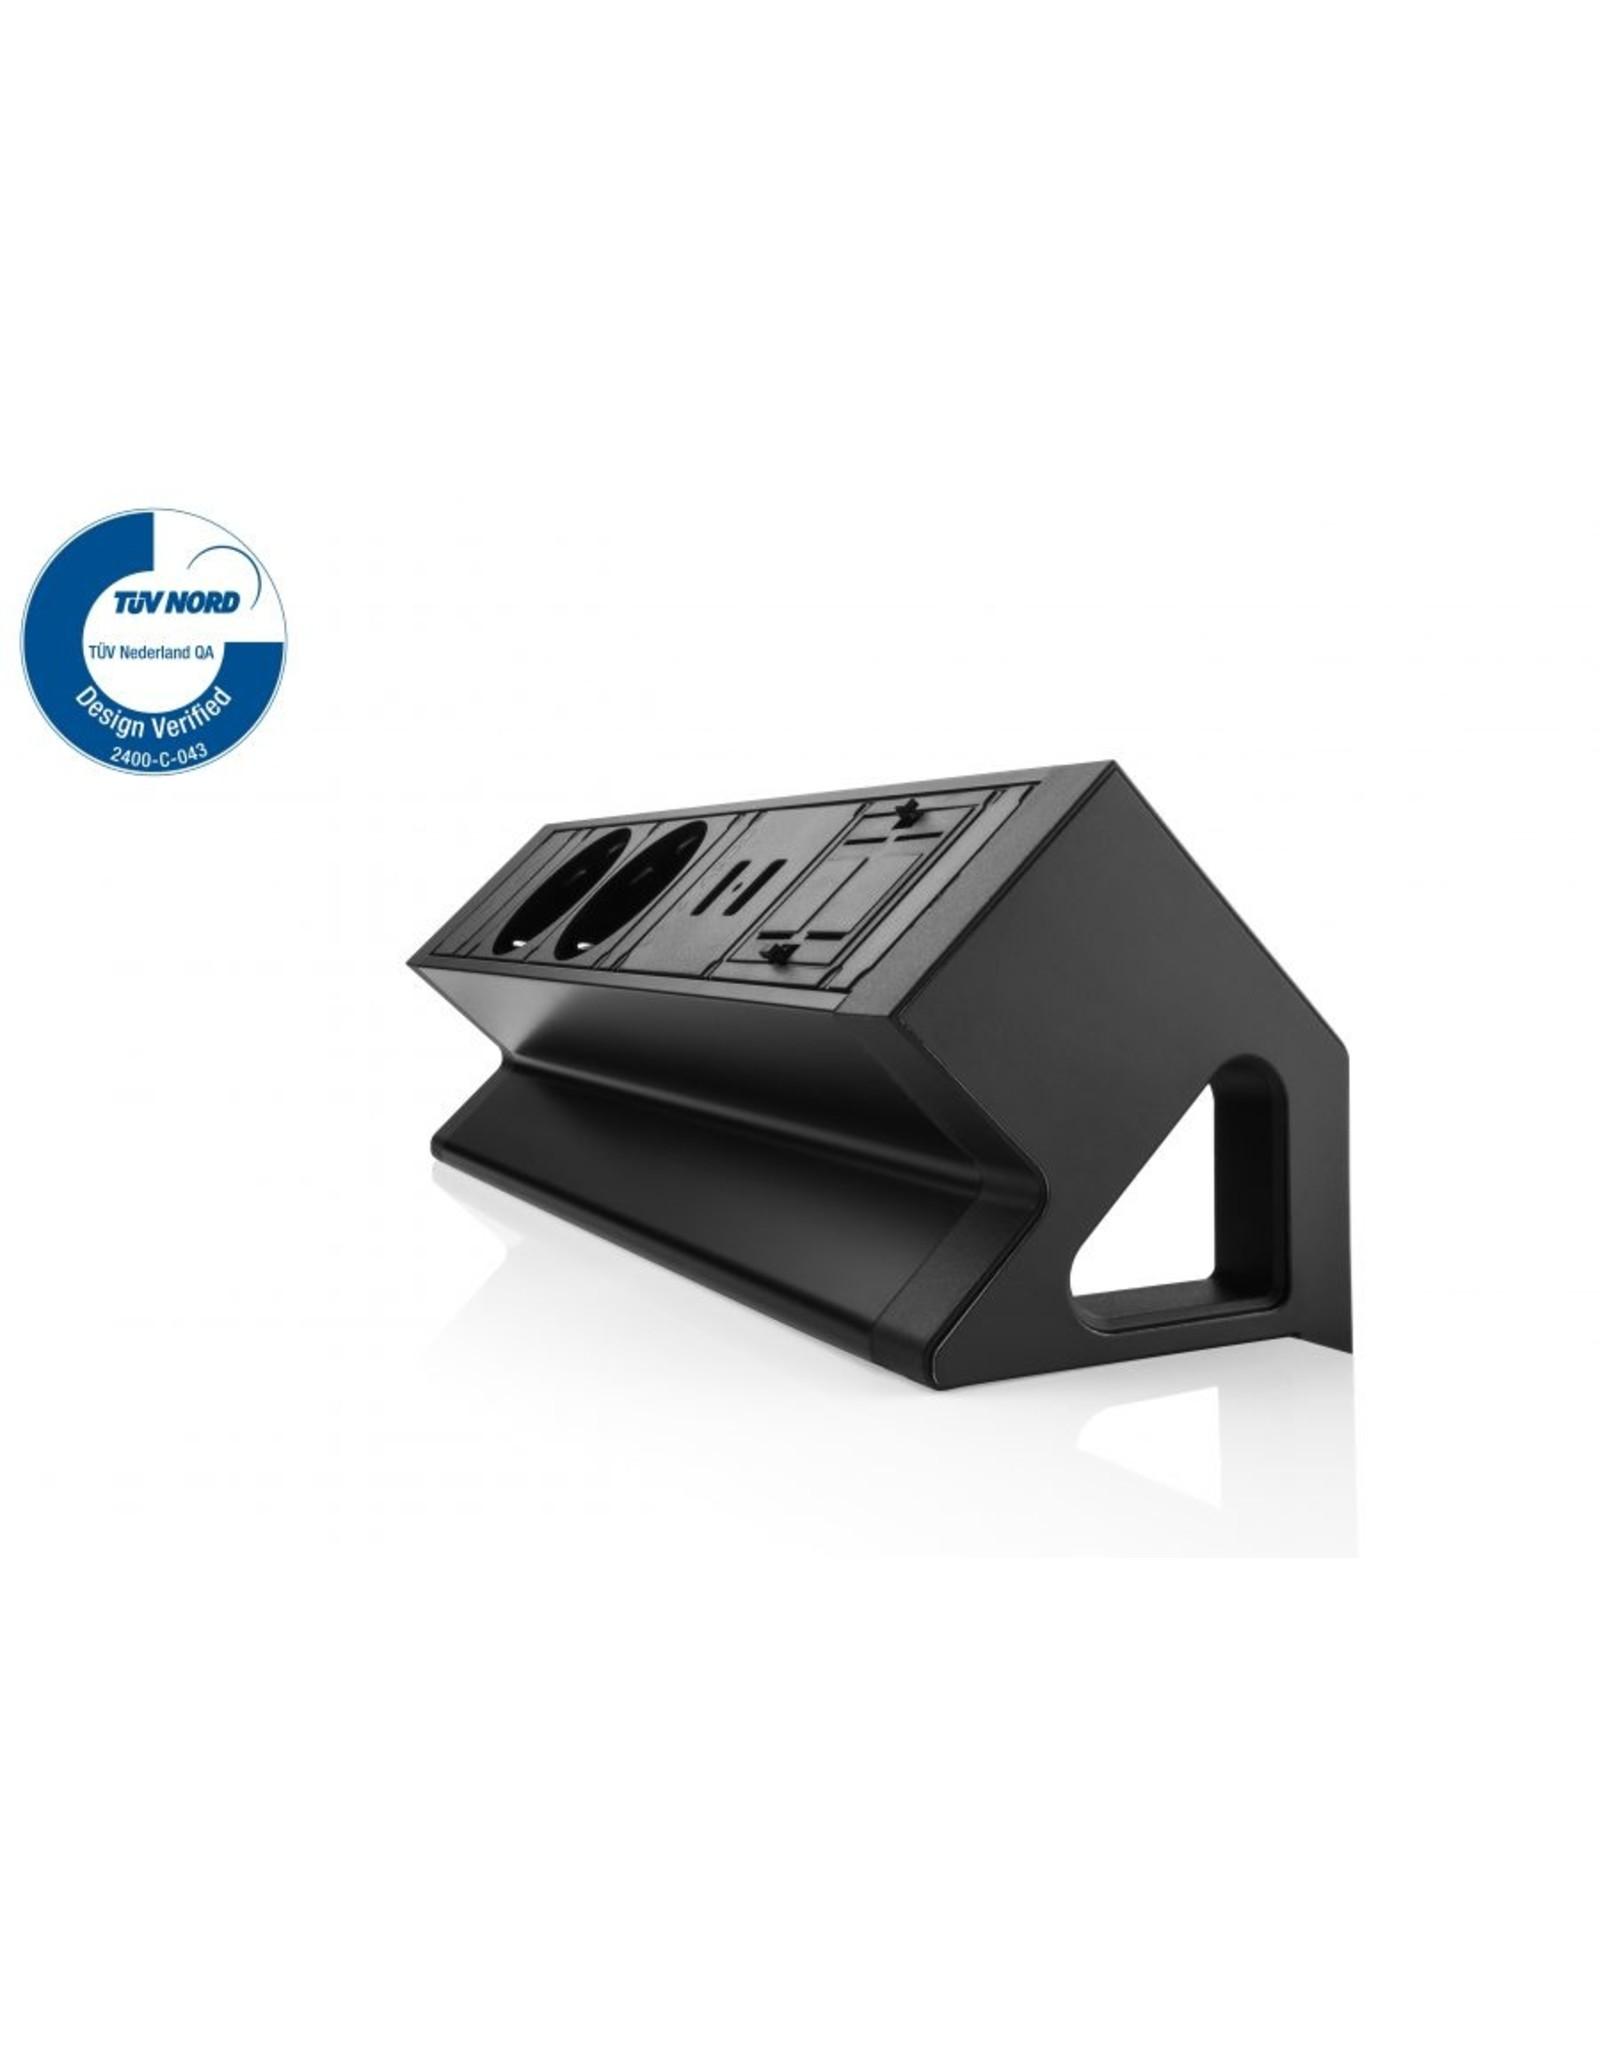 Filex Power Desk up 2.0 - 2x 230V - 2x USB charger - 1x keystone